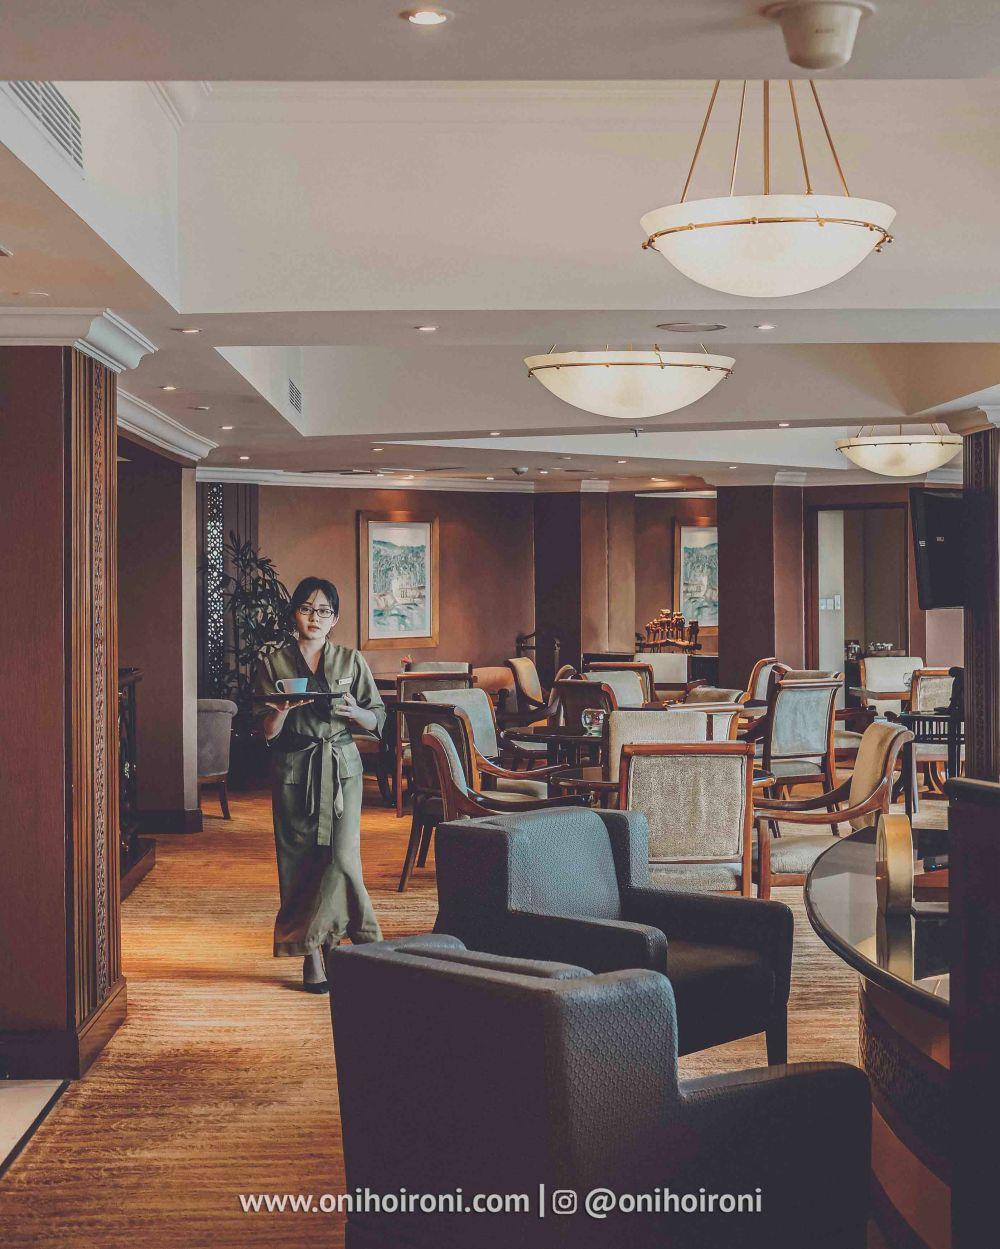 4 Review Horizon Club Lounge Shangrila Surabaya Hotel Oni hoironi